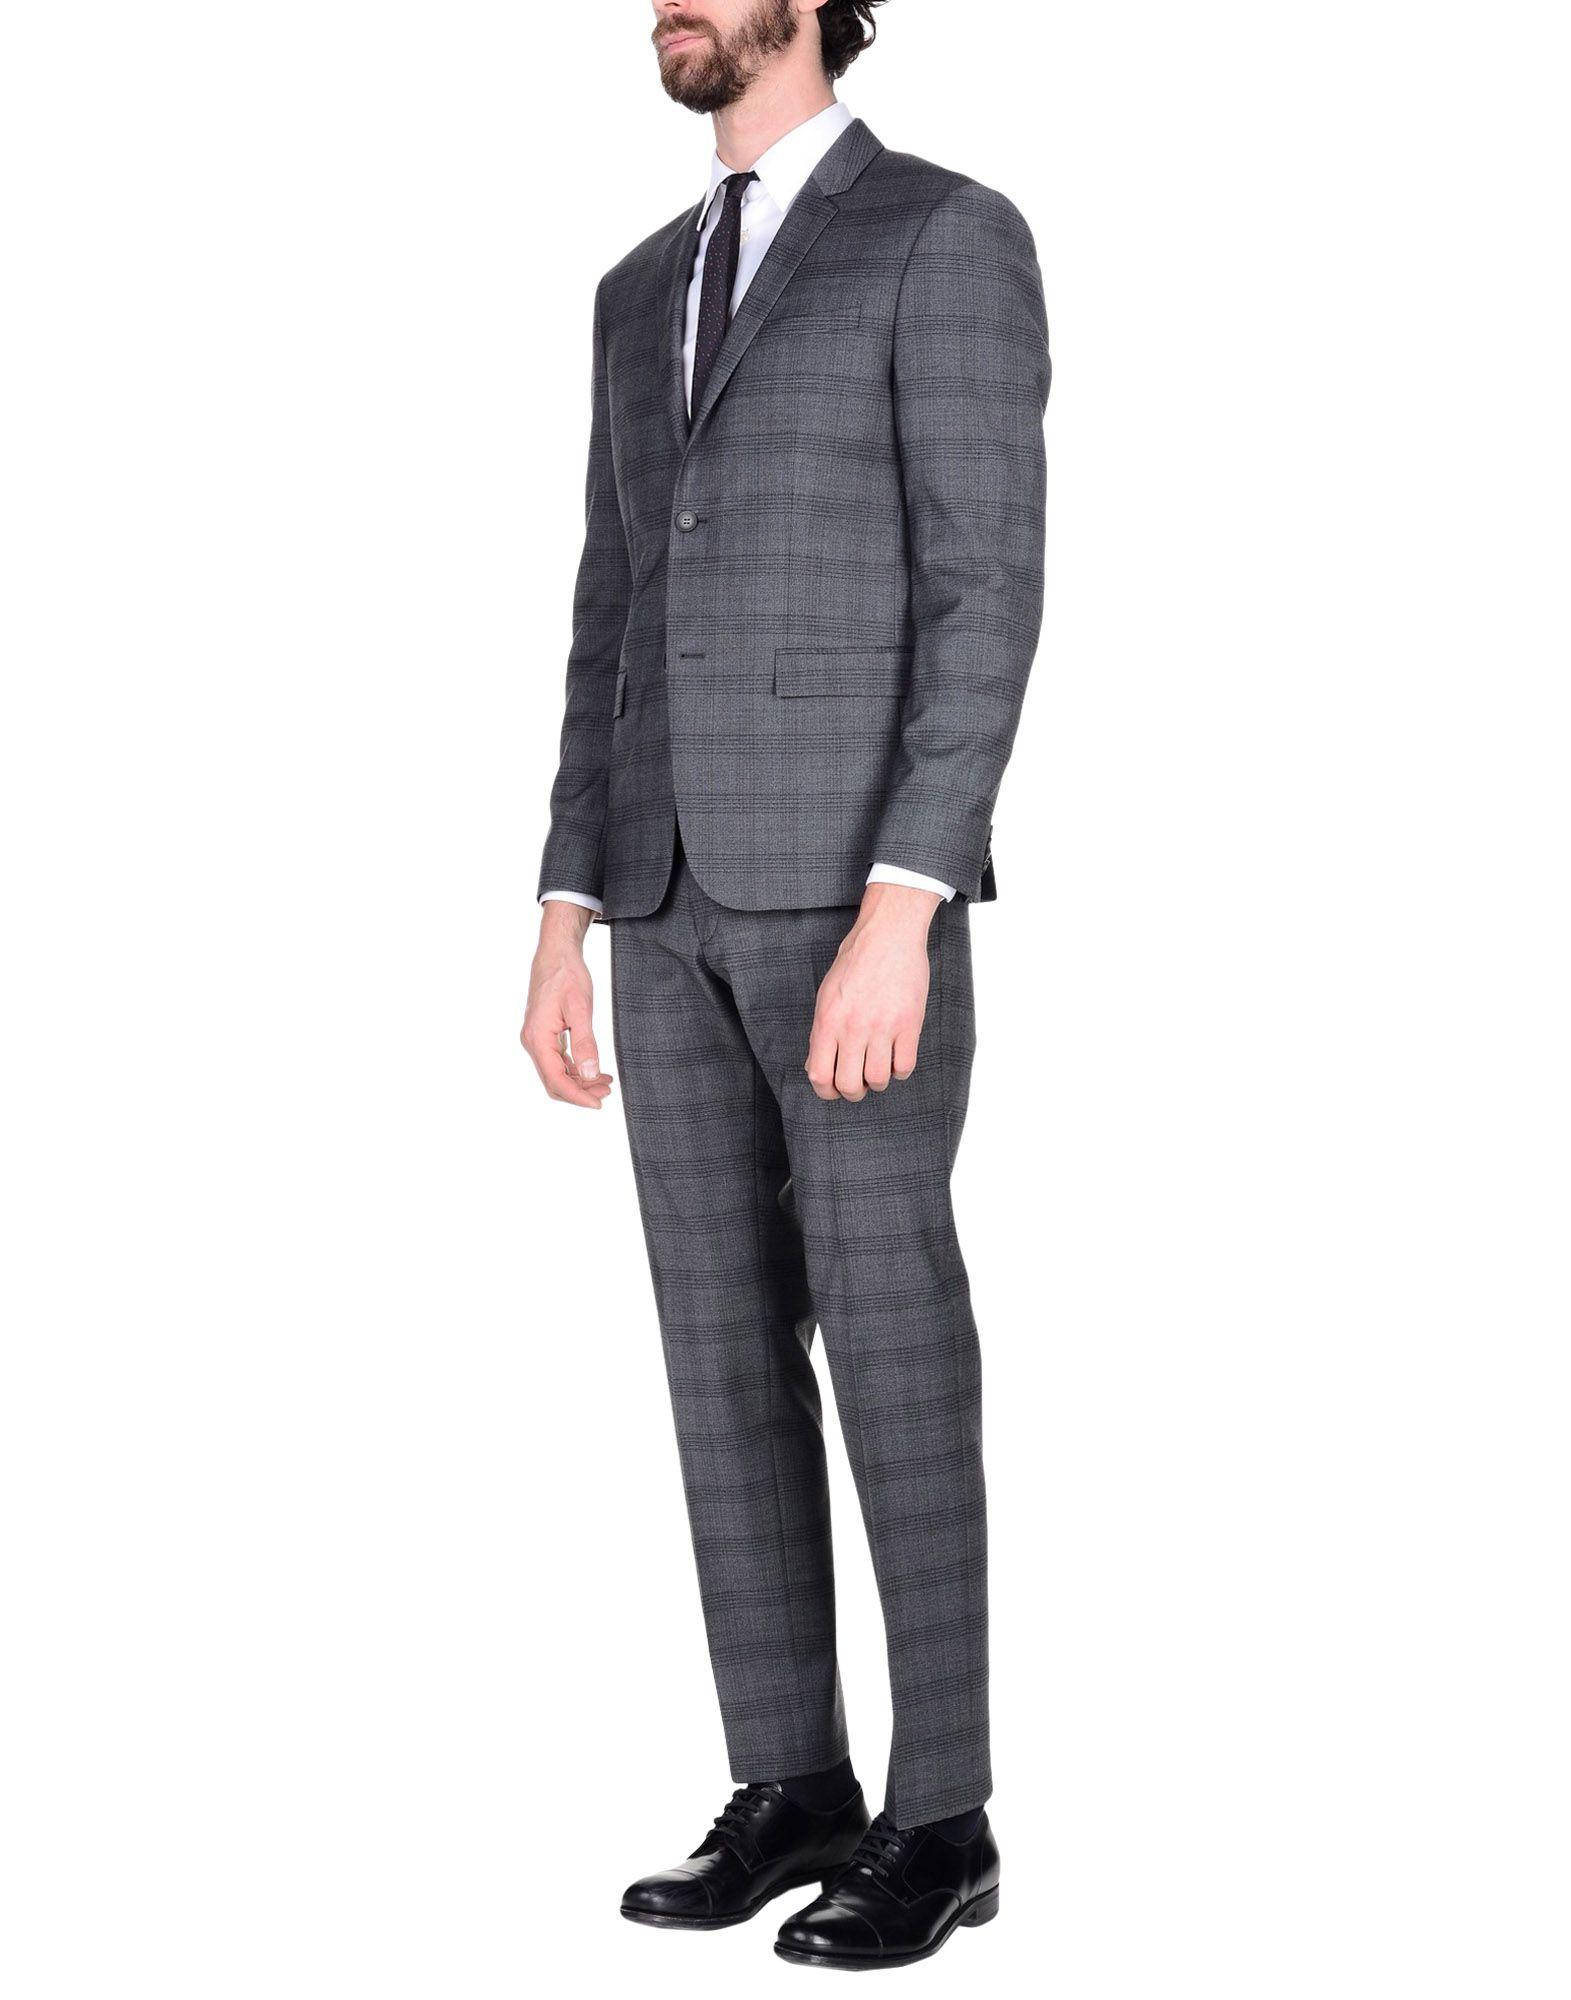 5ca58040f70a Calvin Klein Άνδρας - Calvin Klein Κοστουμια Και Σακακια - YOOX Greece